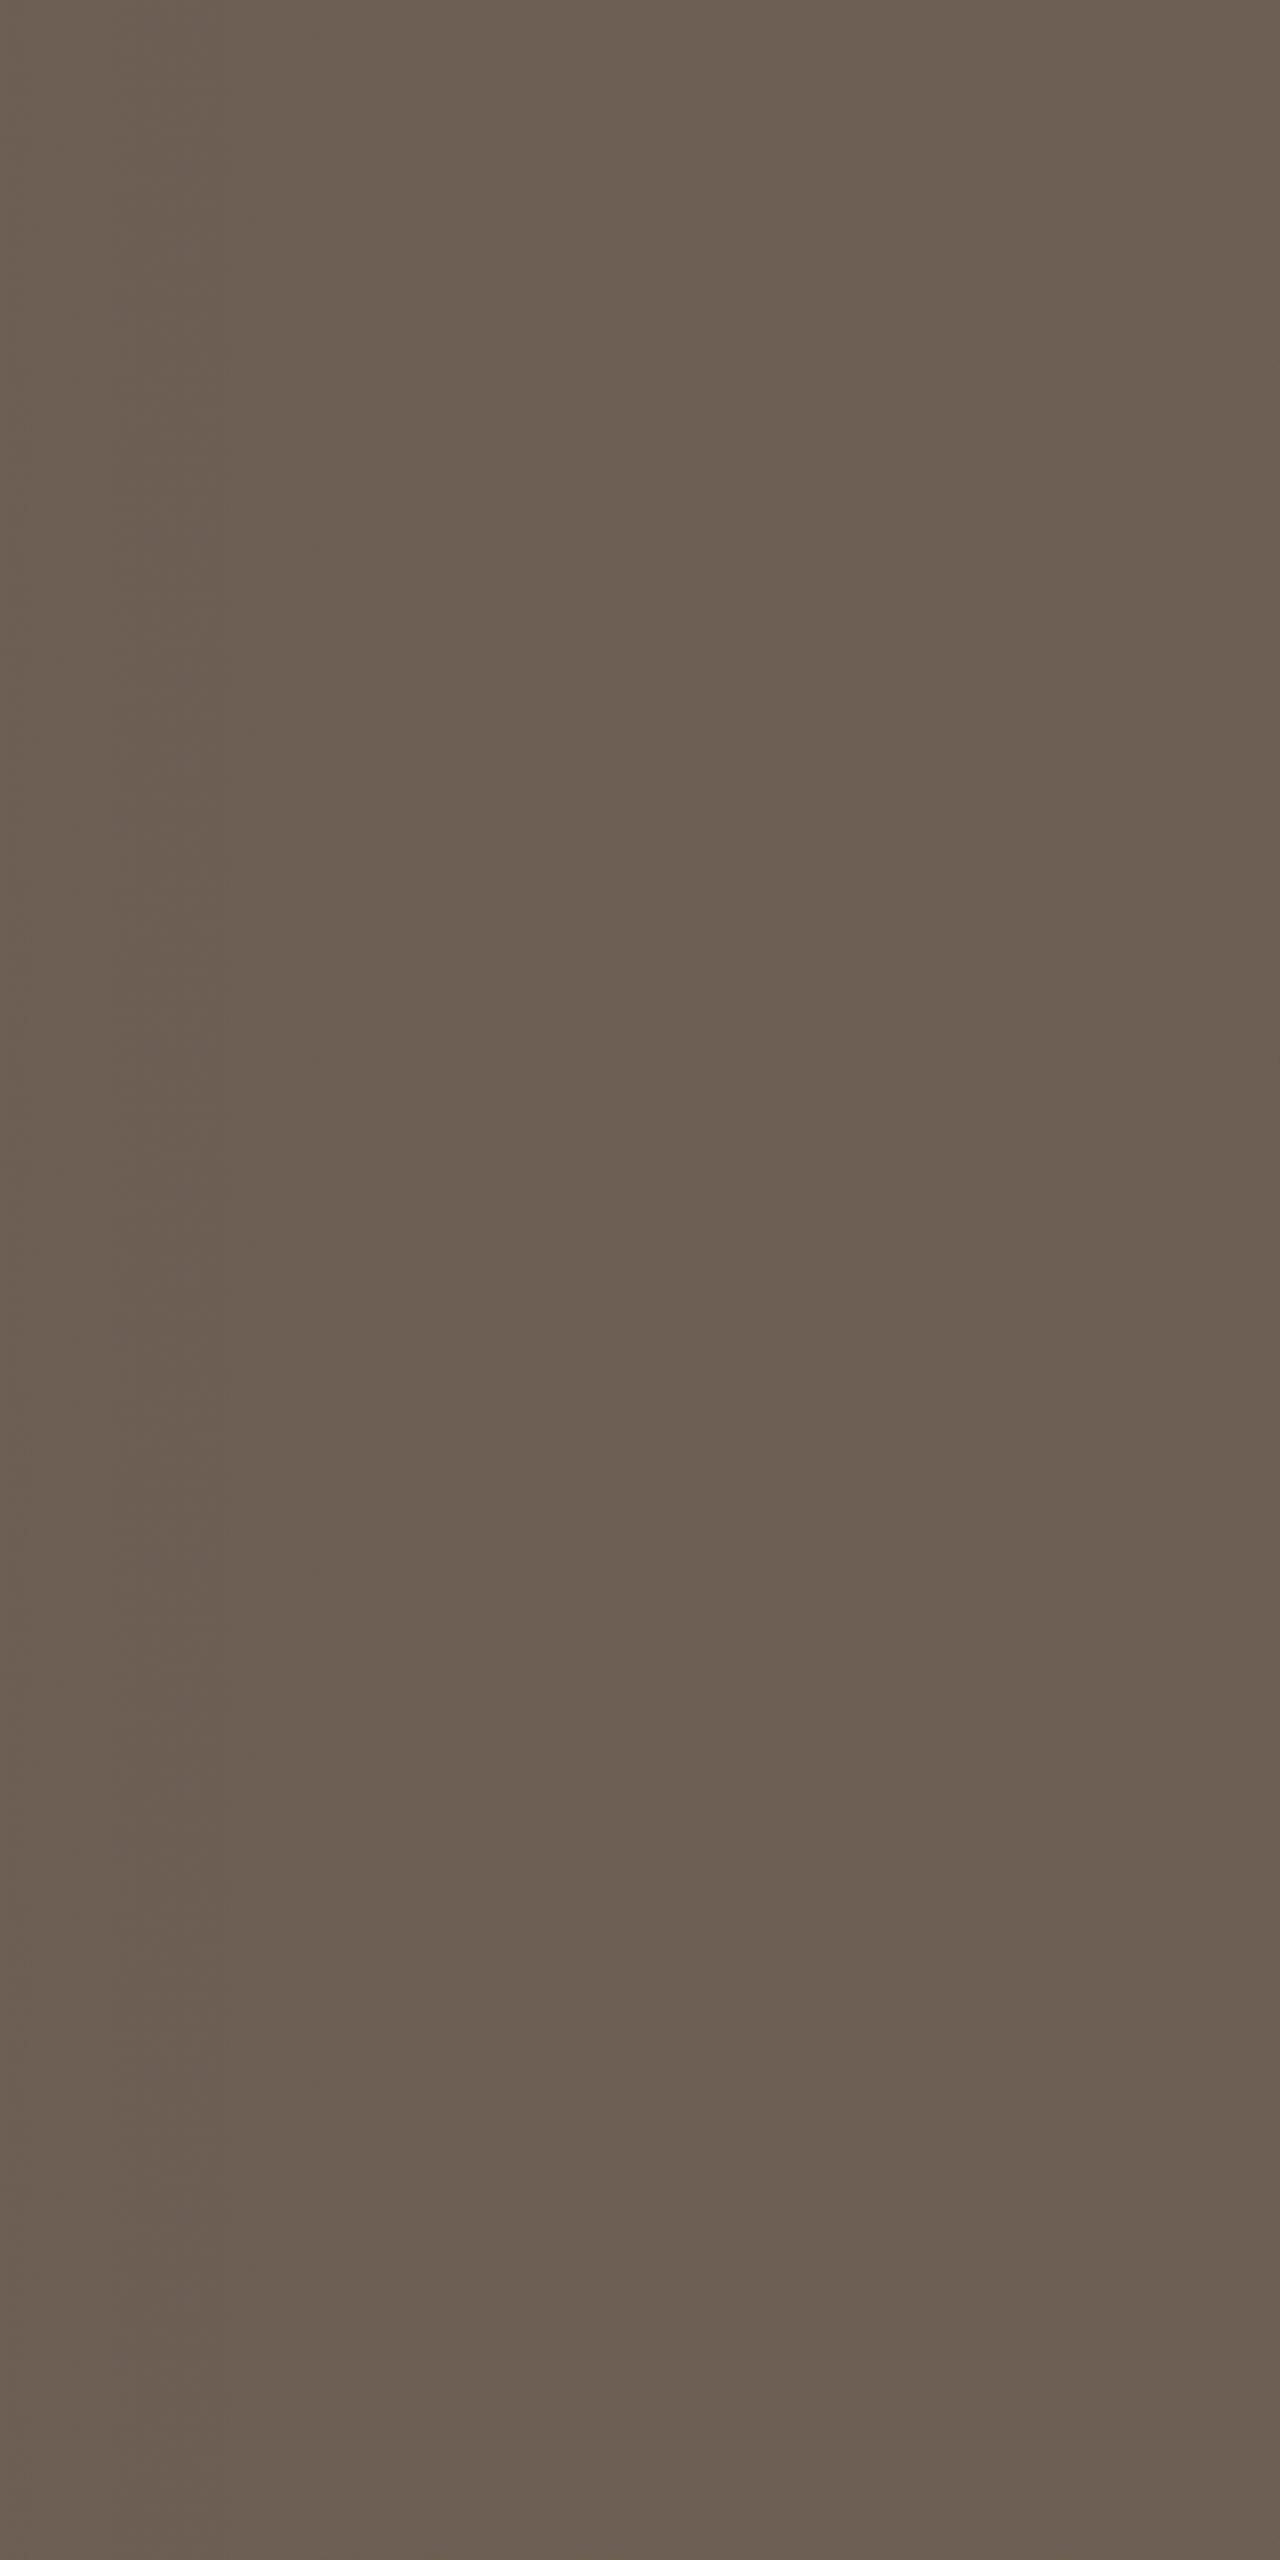 Crayons of Cerim Hazelnut Matte 6mm 120 x 240